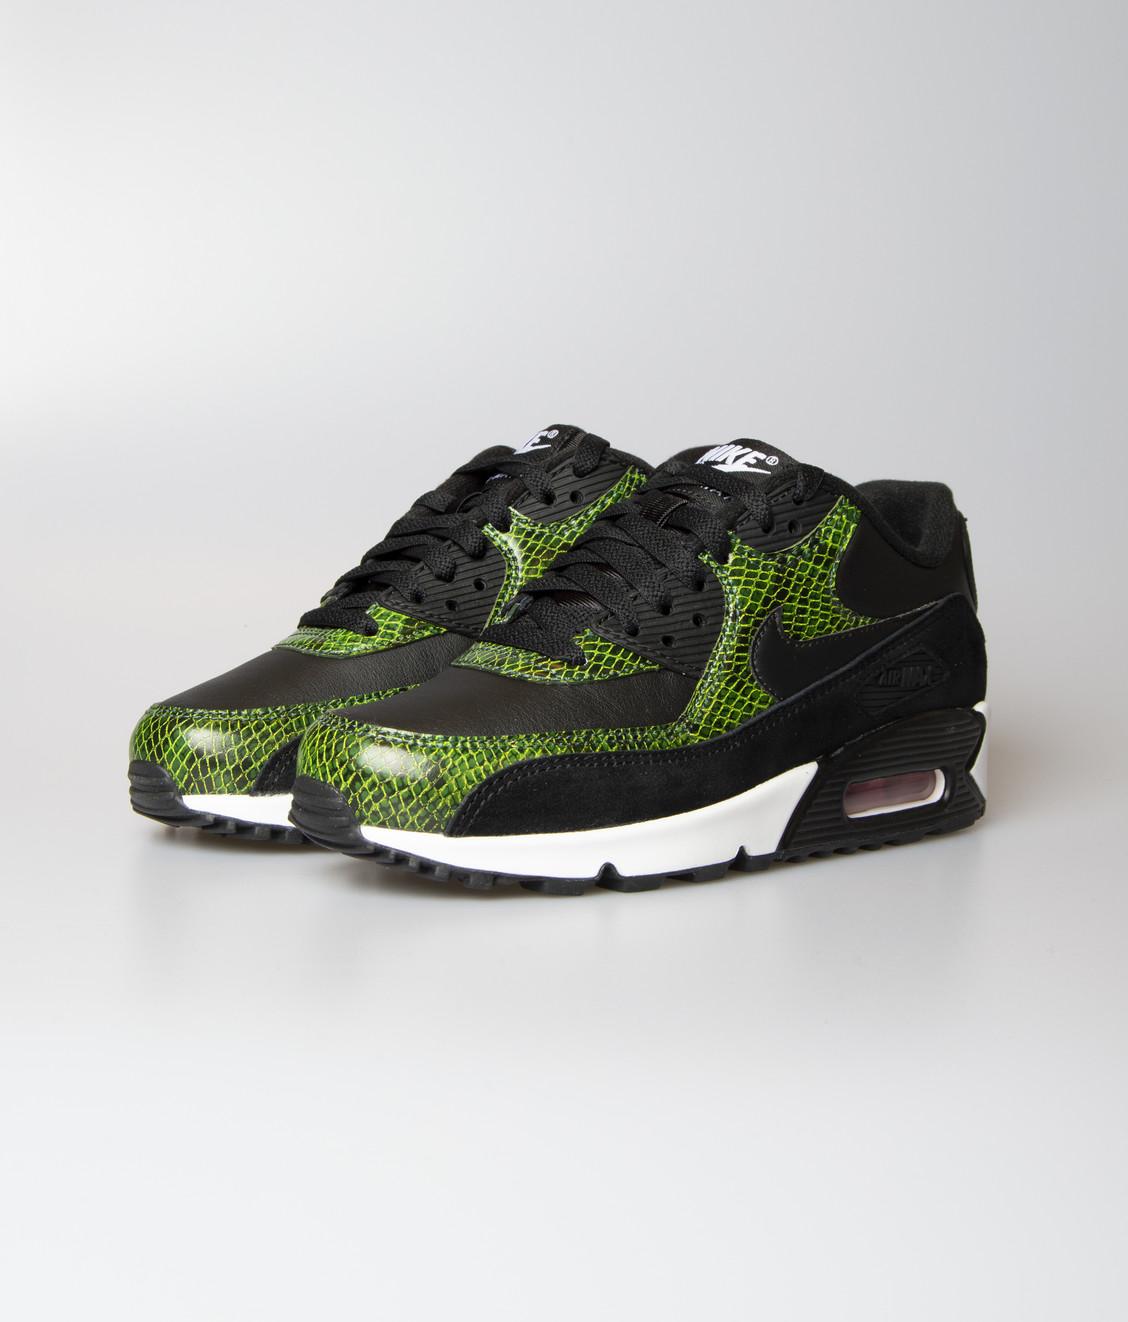 Nike Nike Air Max 90 QS Black Cyber Green Python